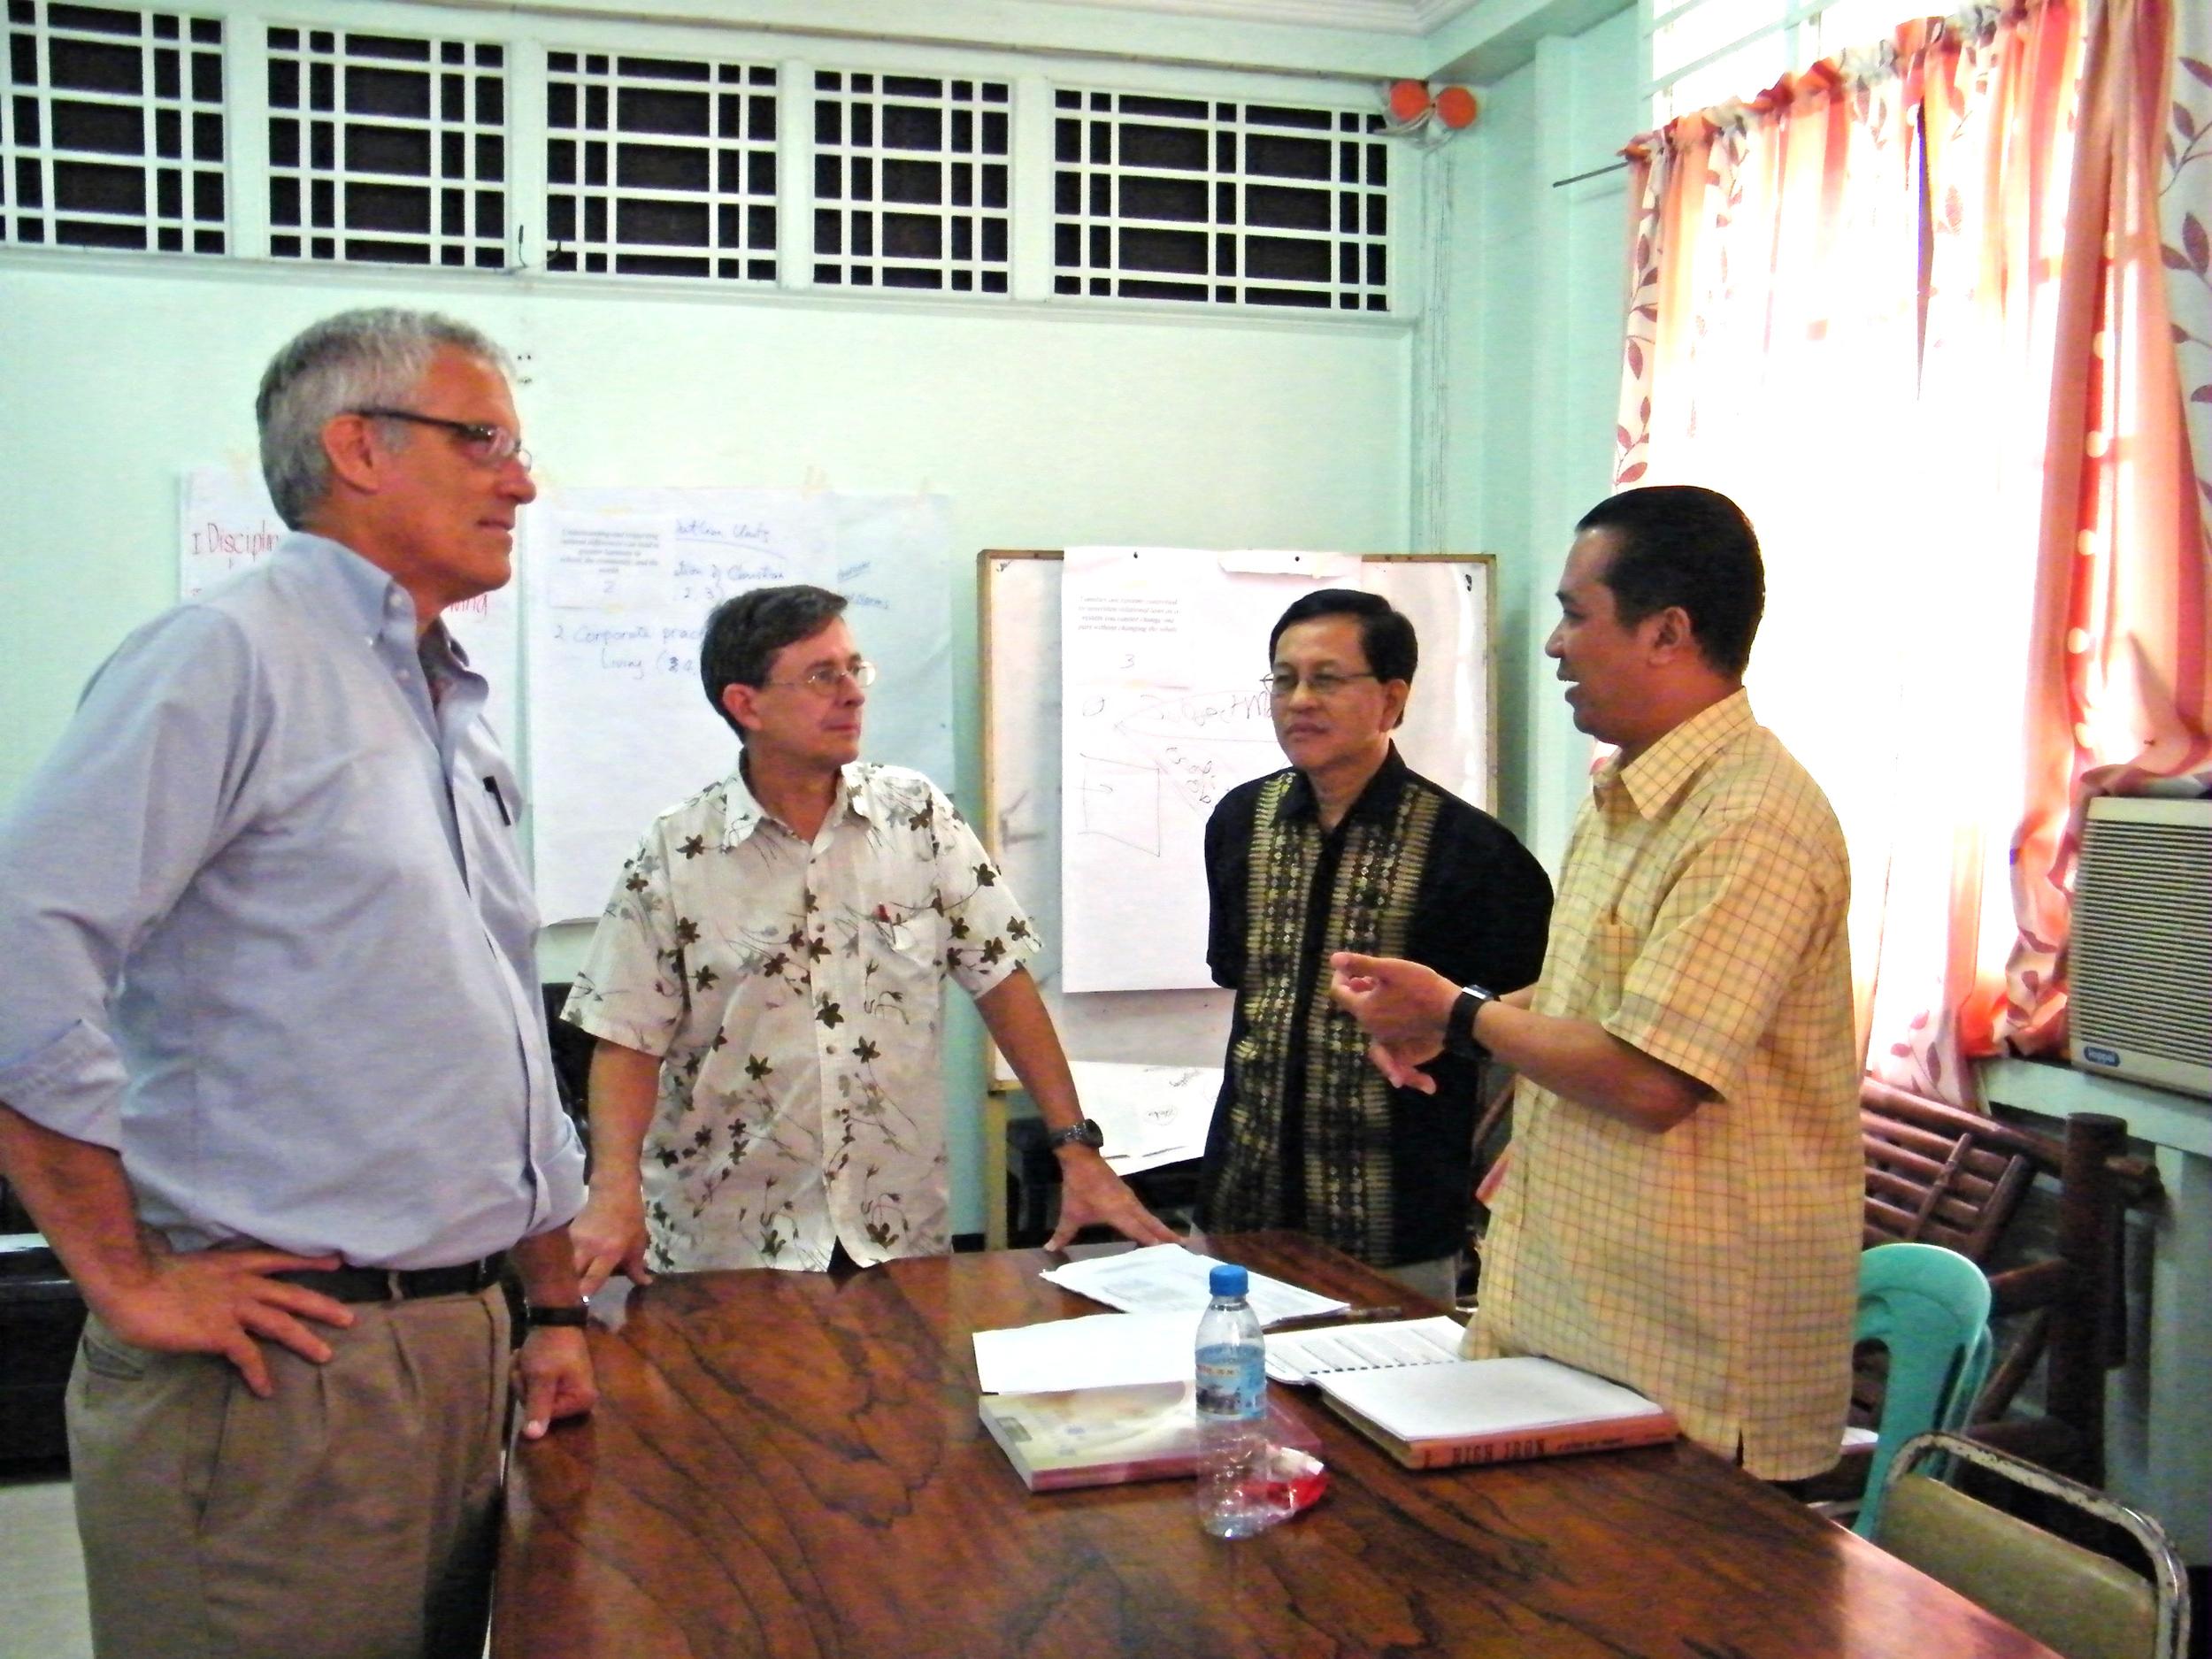 2010 Philippines UbD 1 Doane Dave m2.jpg